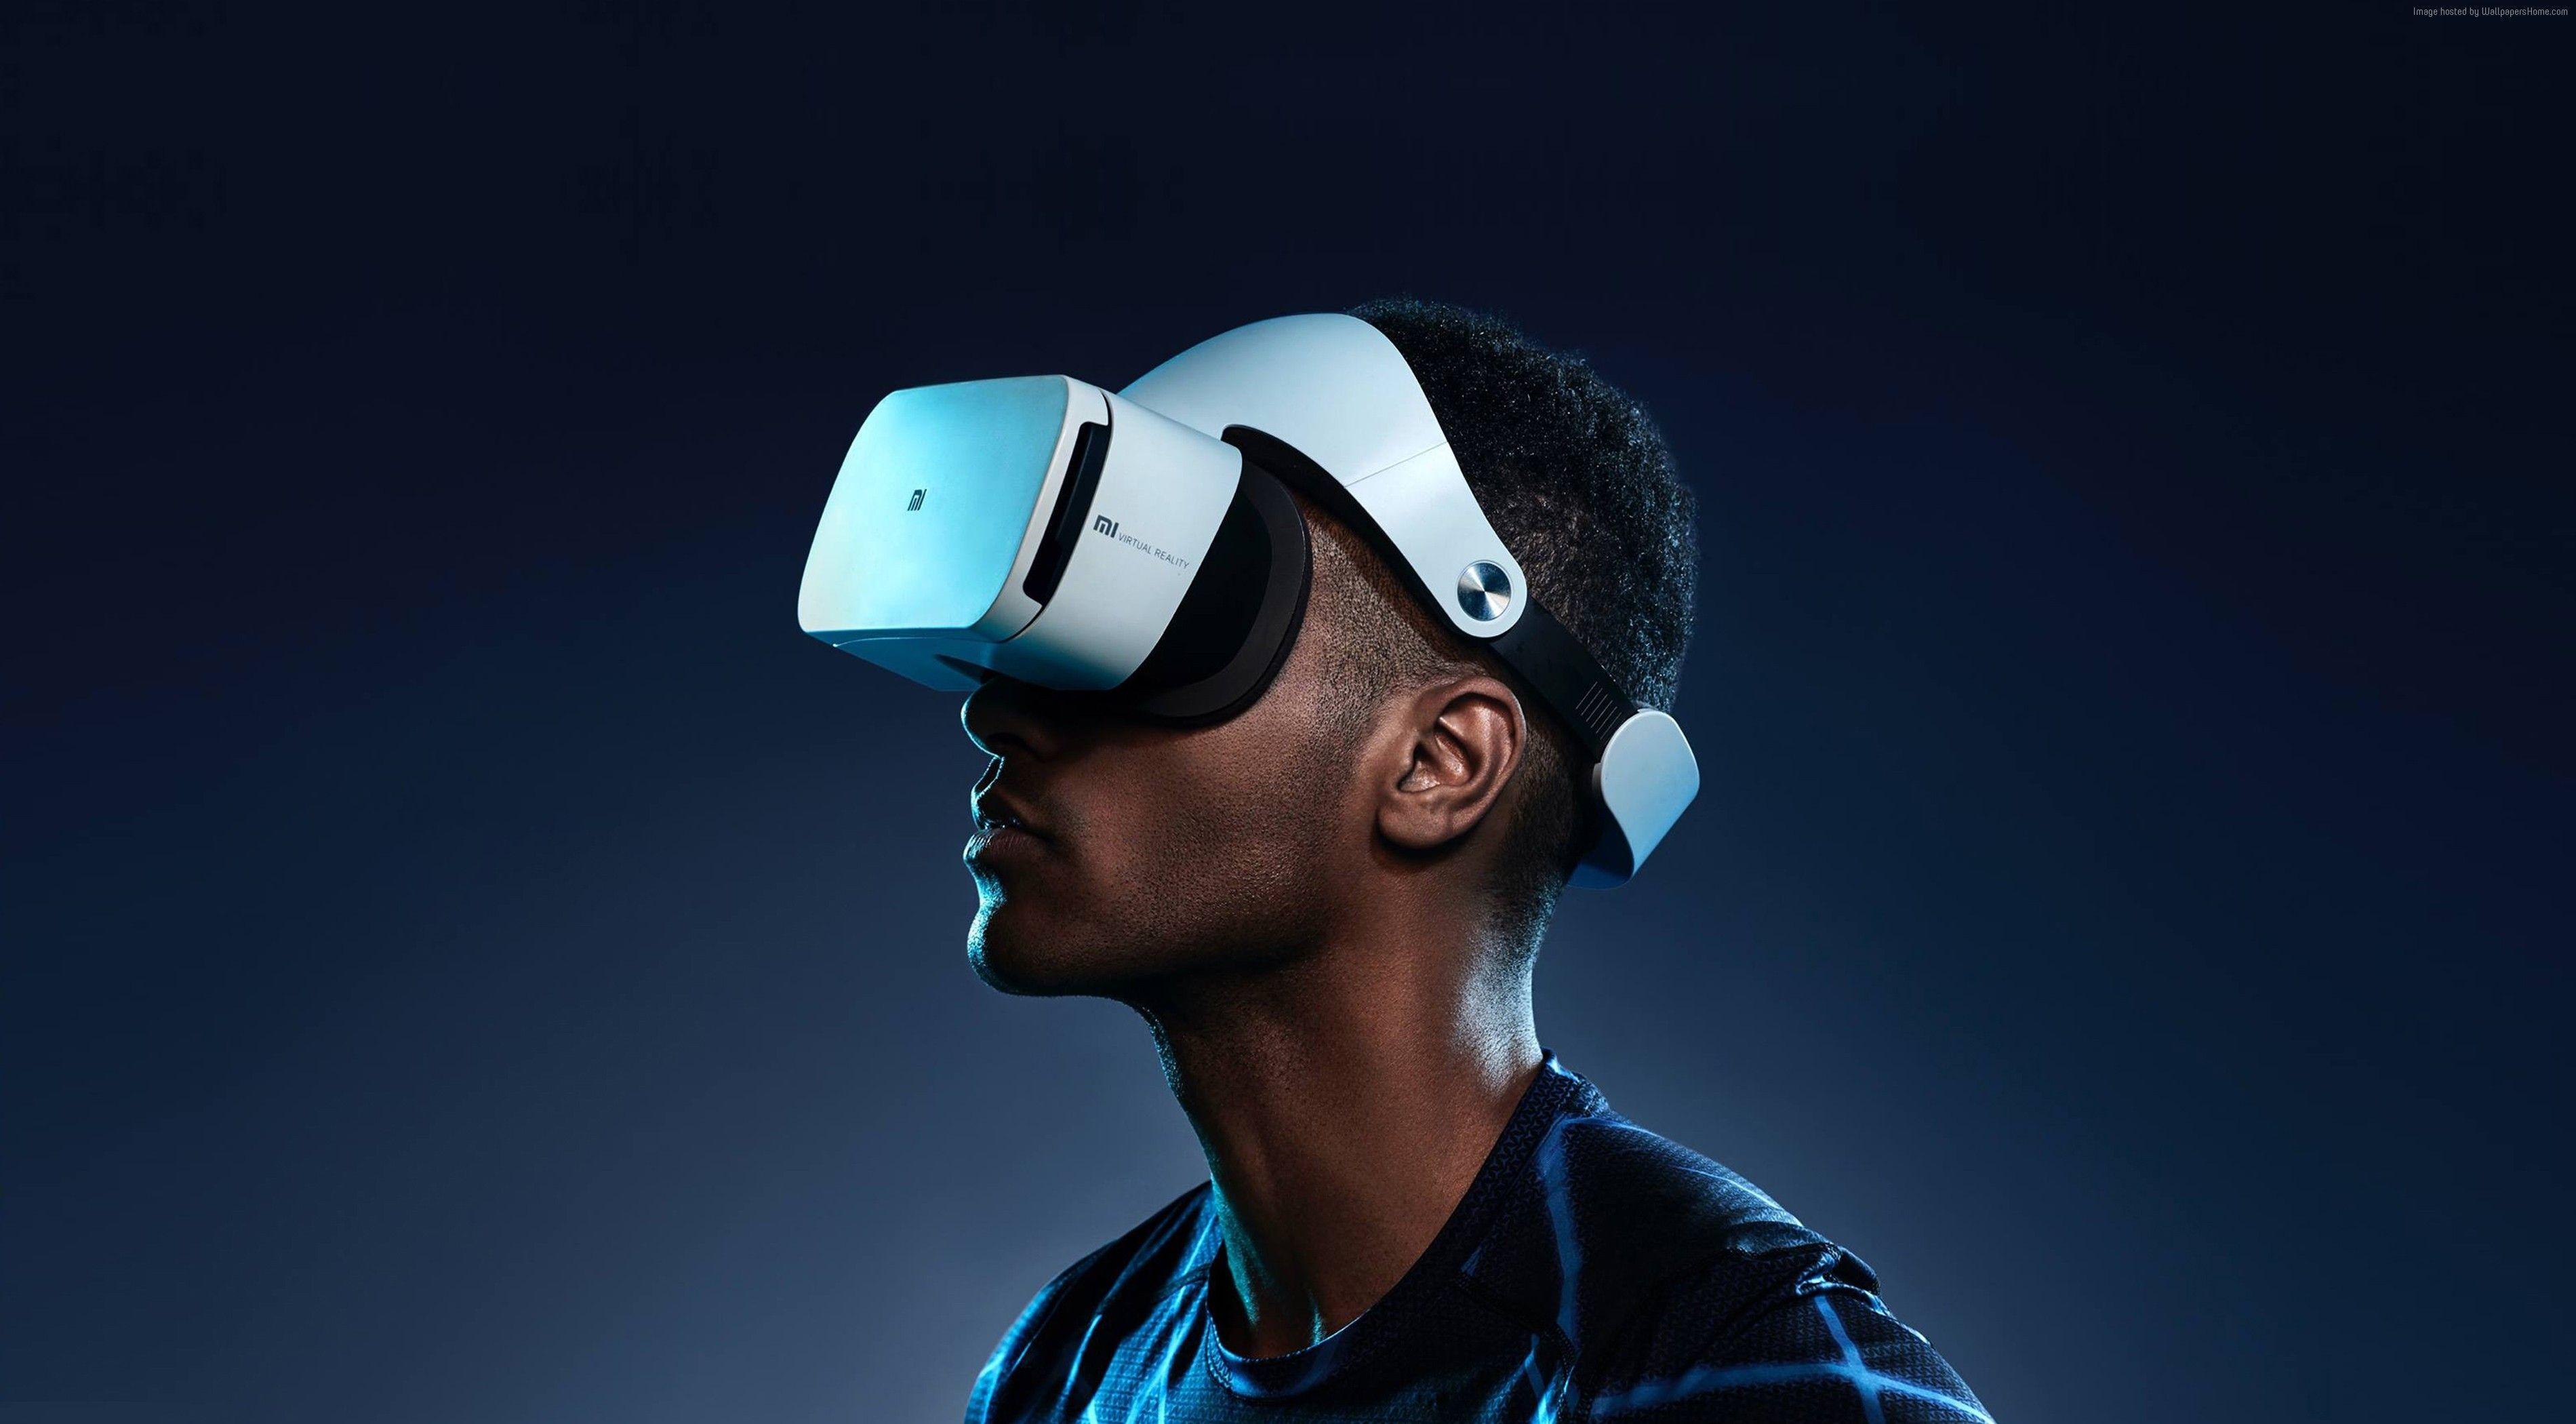 Wallpaper MI VR Xiaomi Virtual Reality Headset Hi